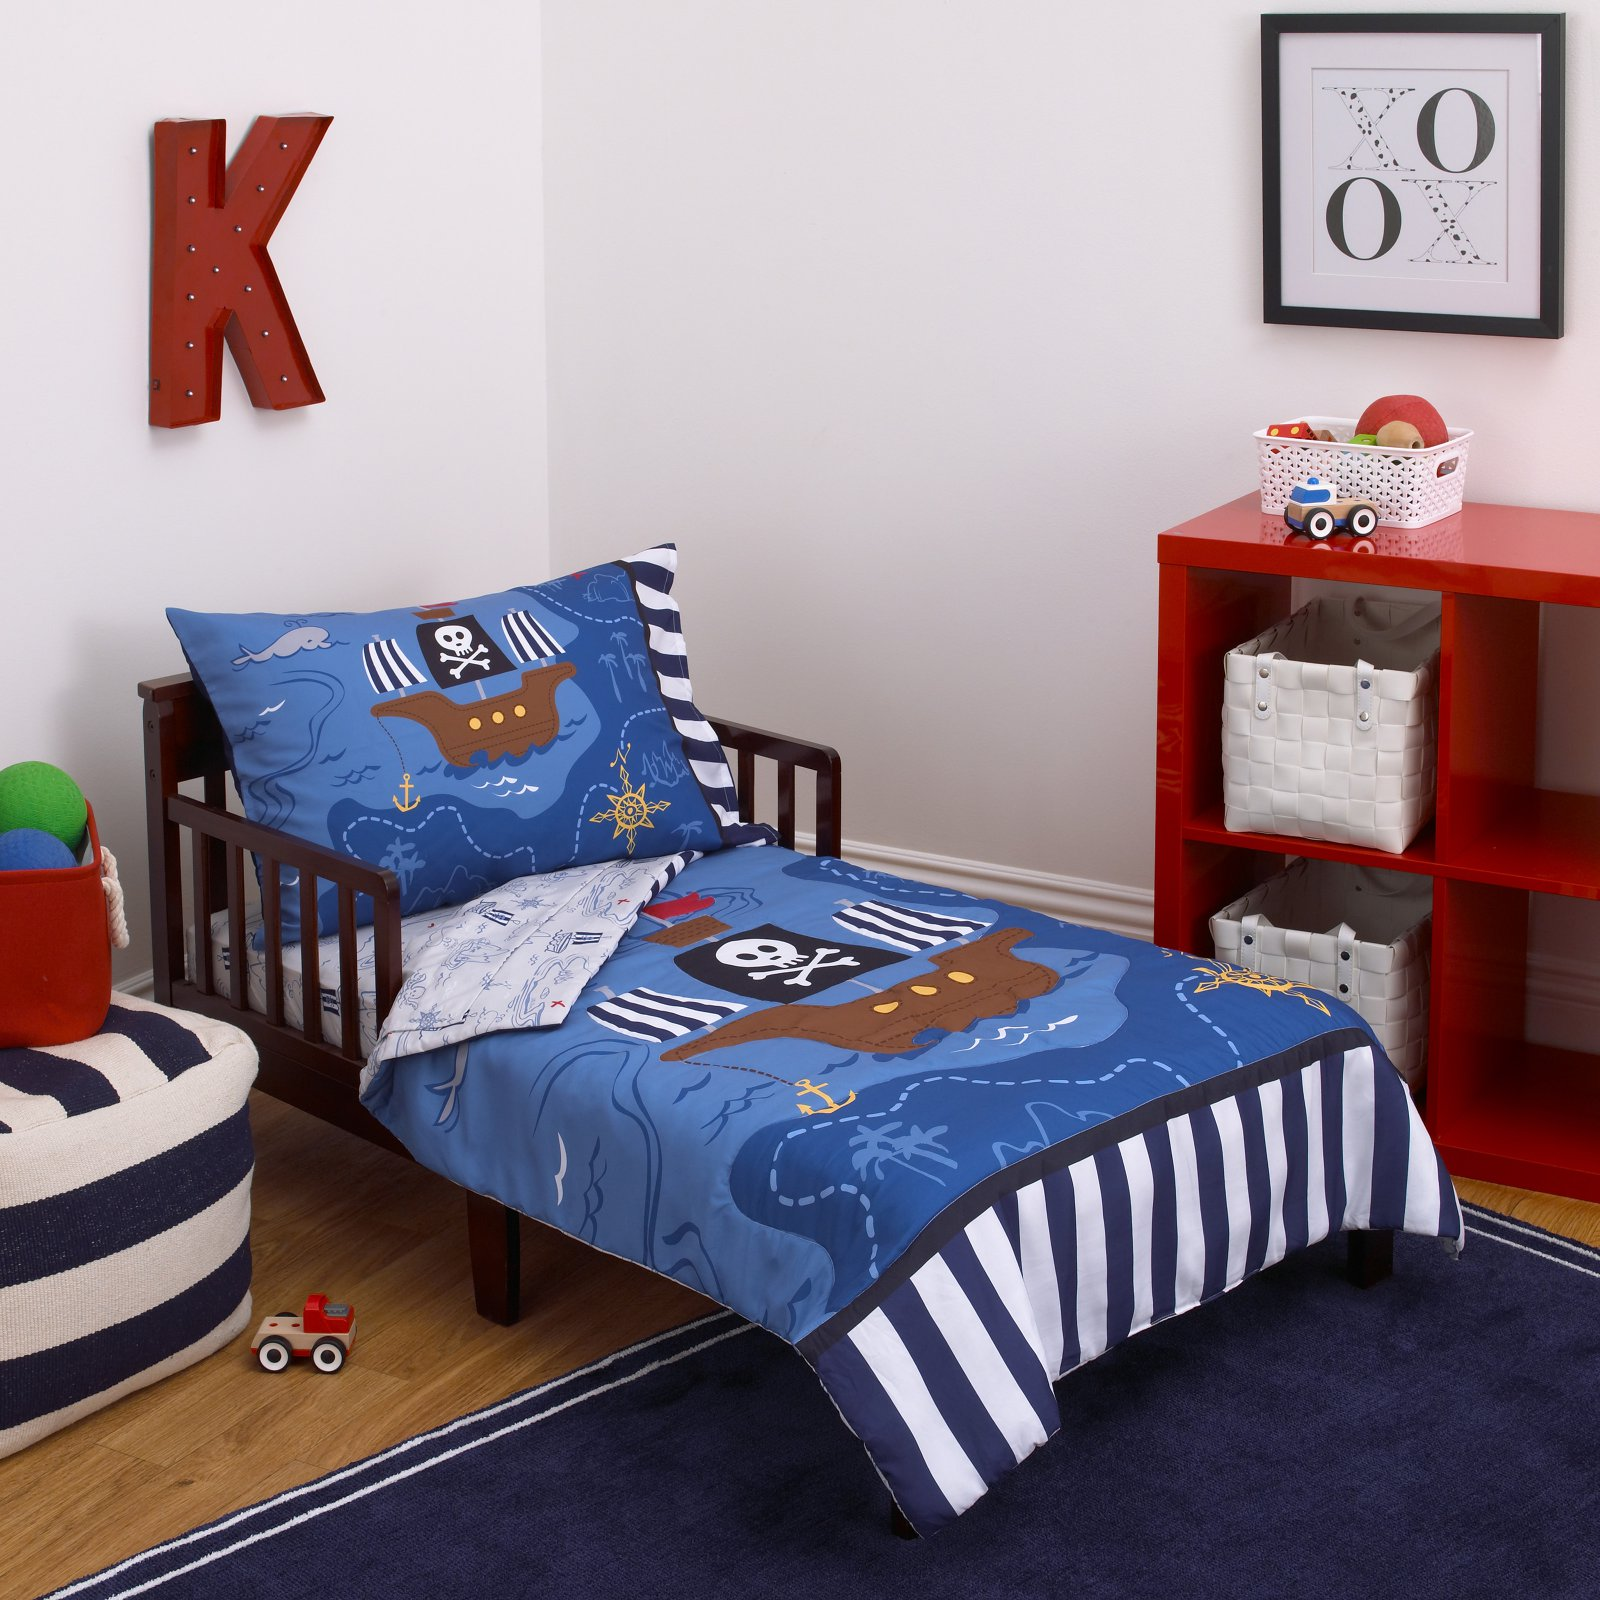 Little Tikes Pirate 4-Piece Toddler Bedding Set